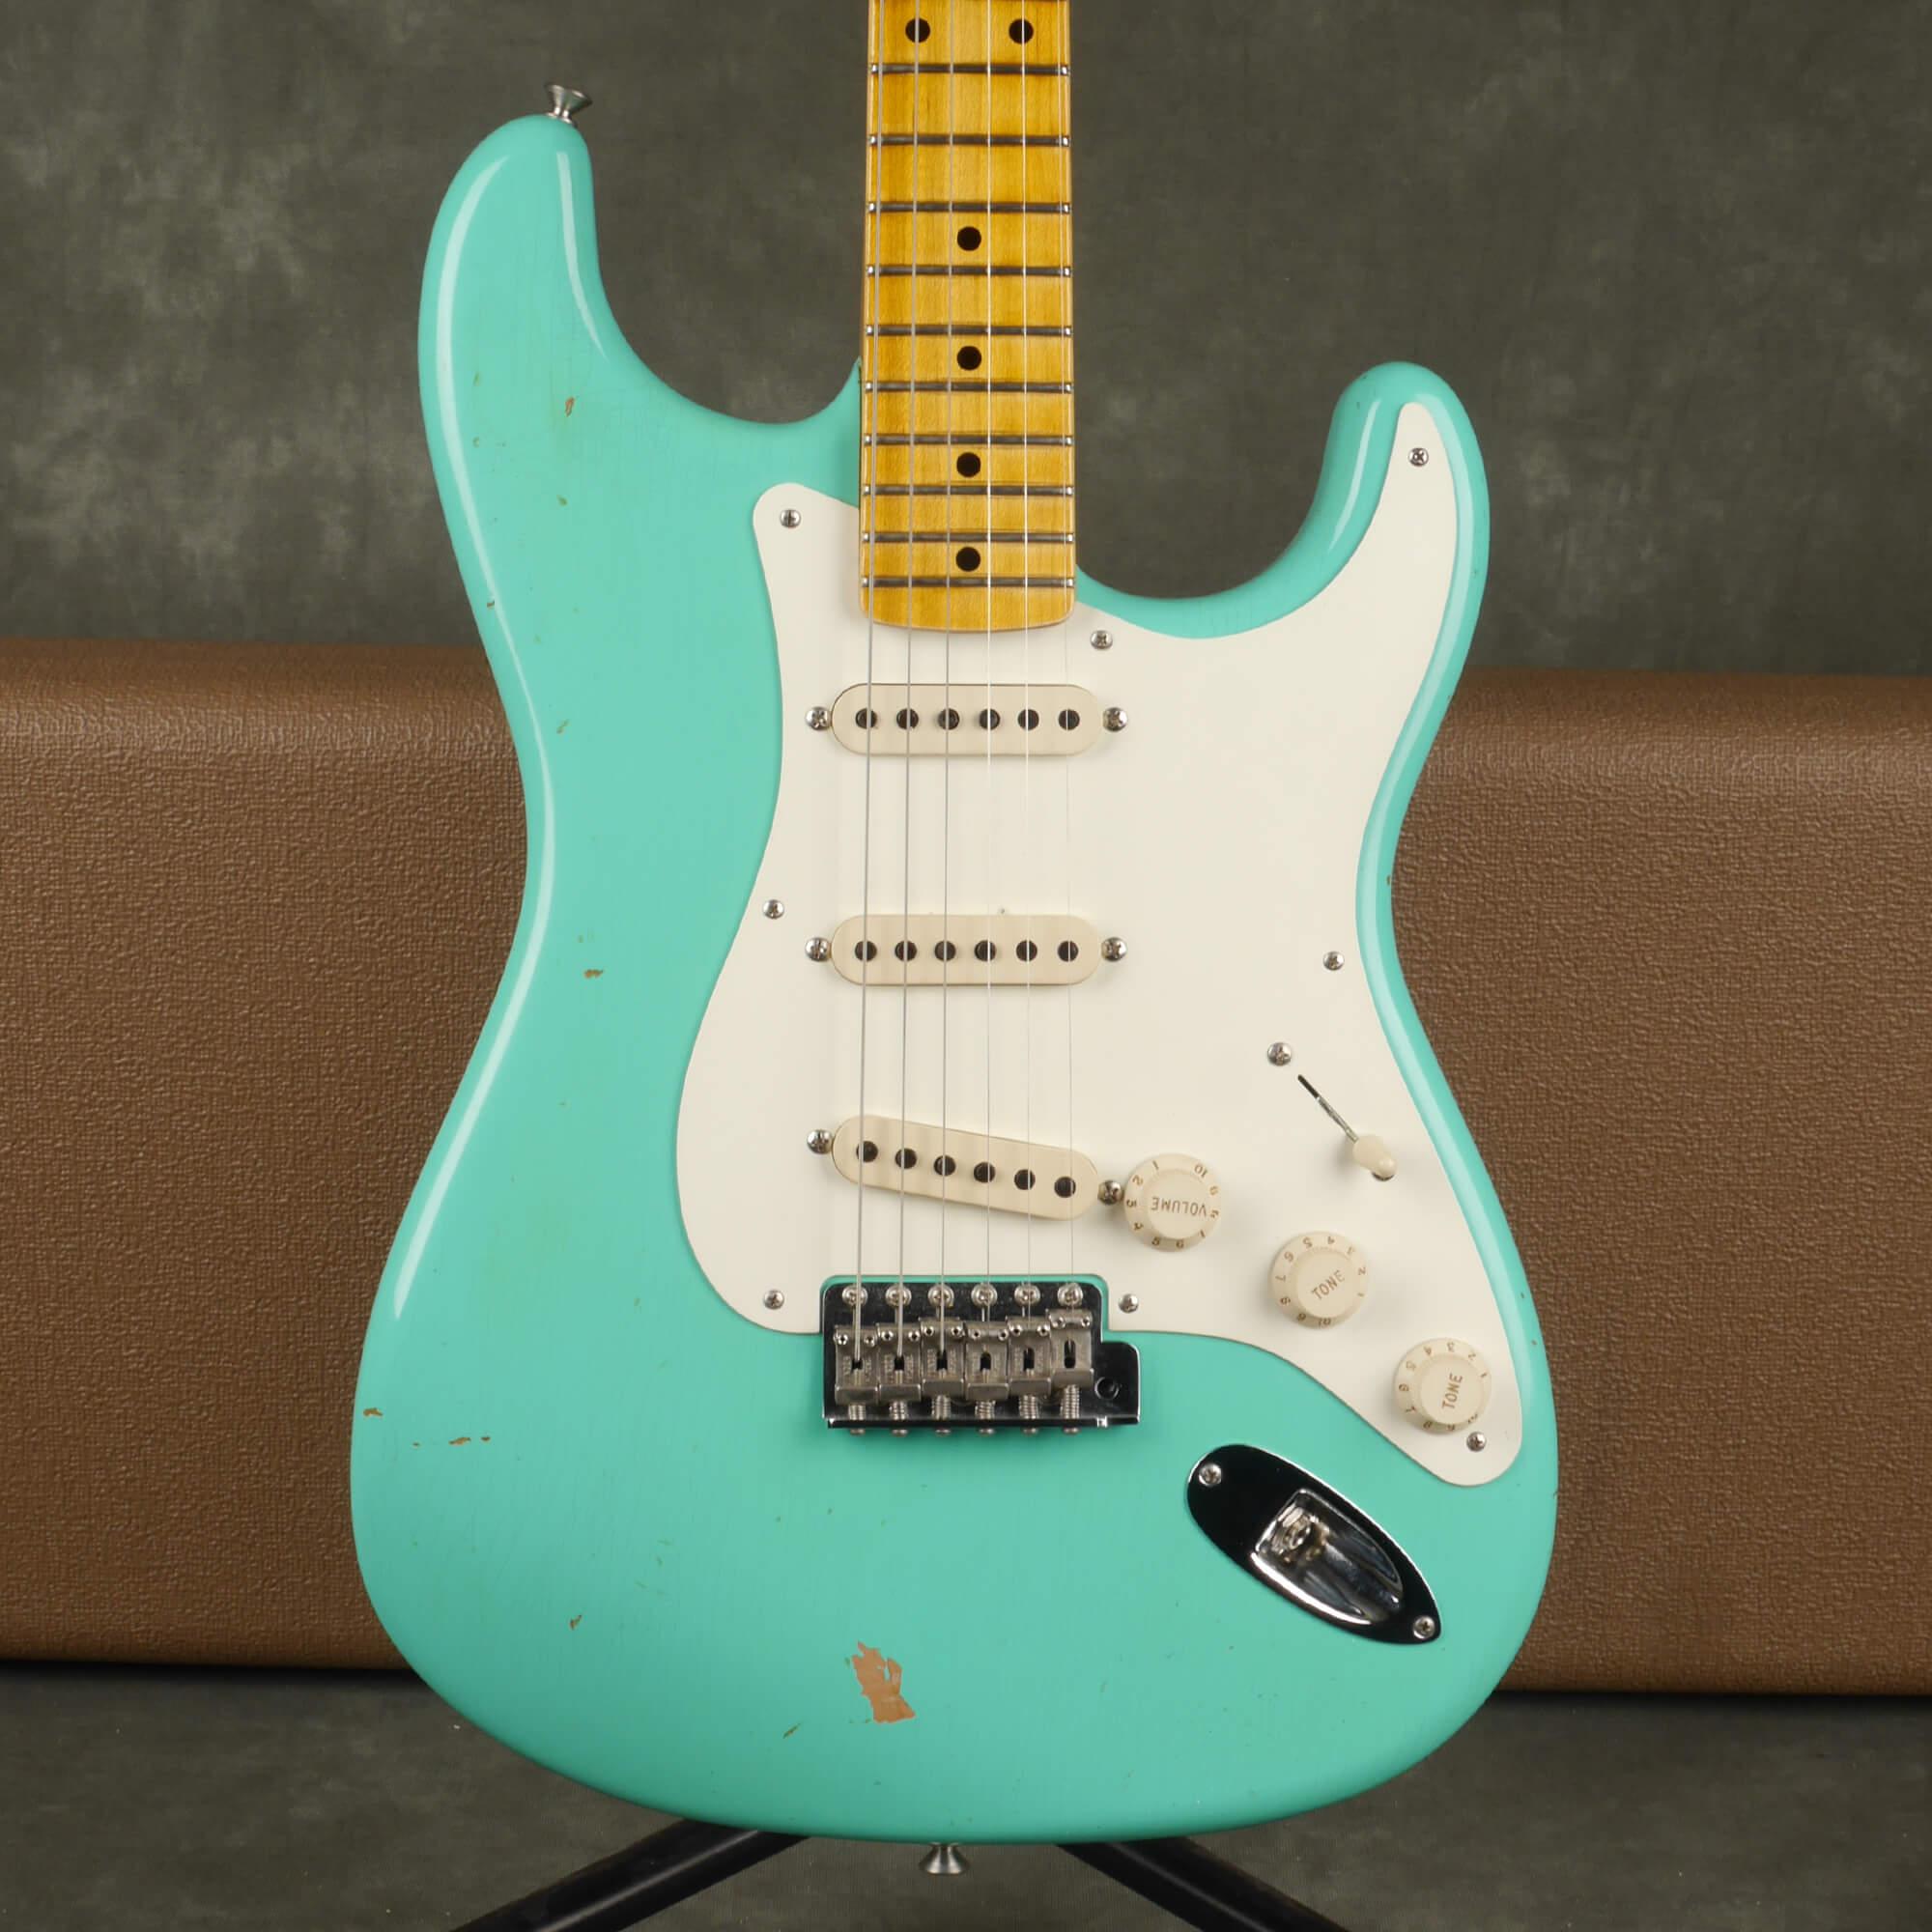 Fender Custom Shop 57 Stratocaster, Relic - Sea Foam Green w/Case - 2nd Hand